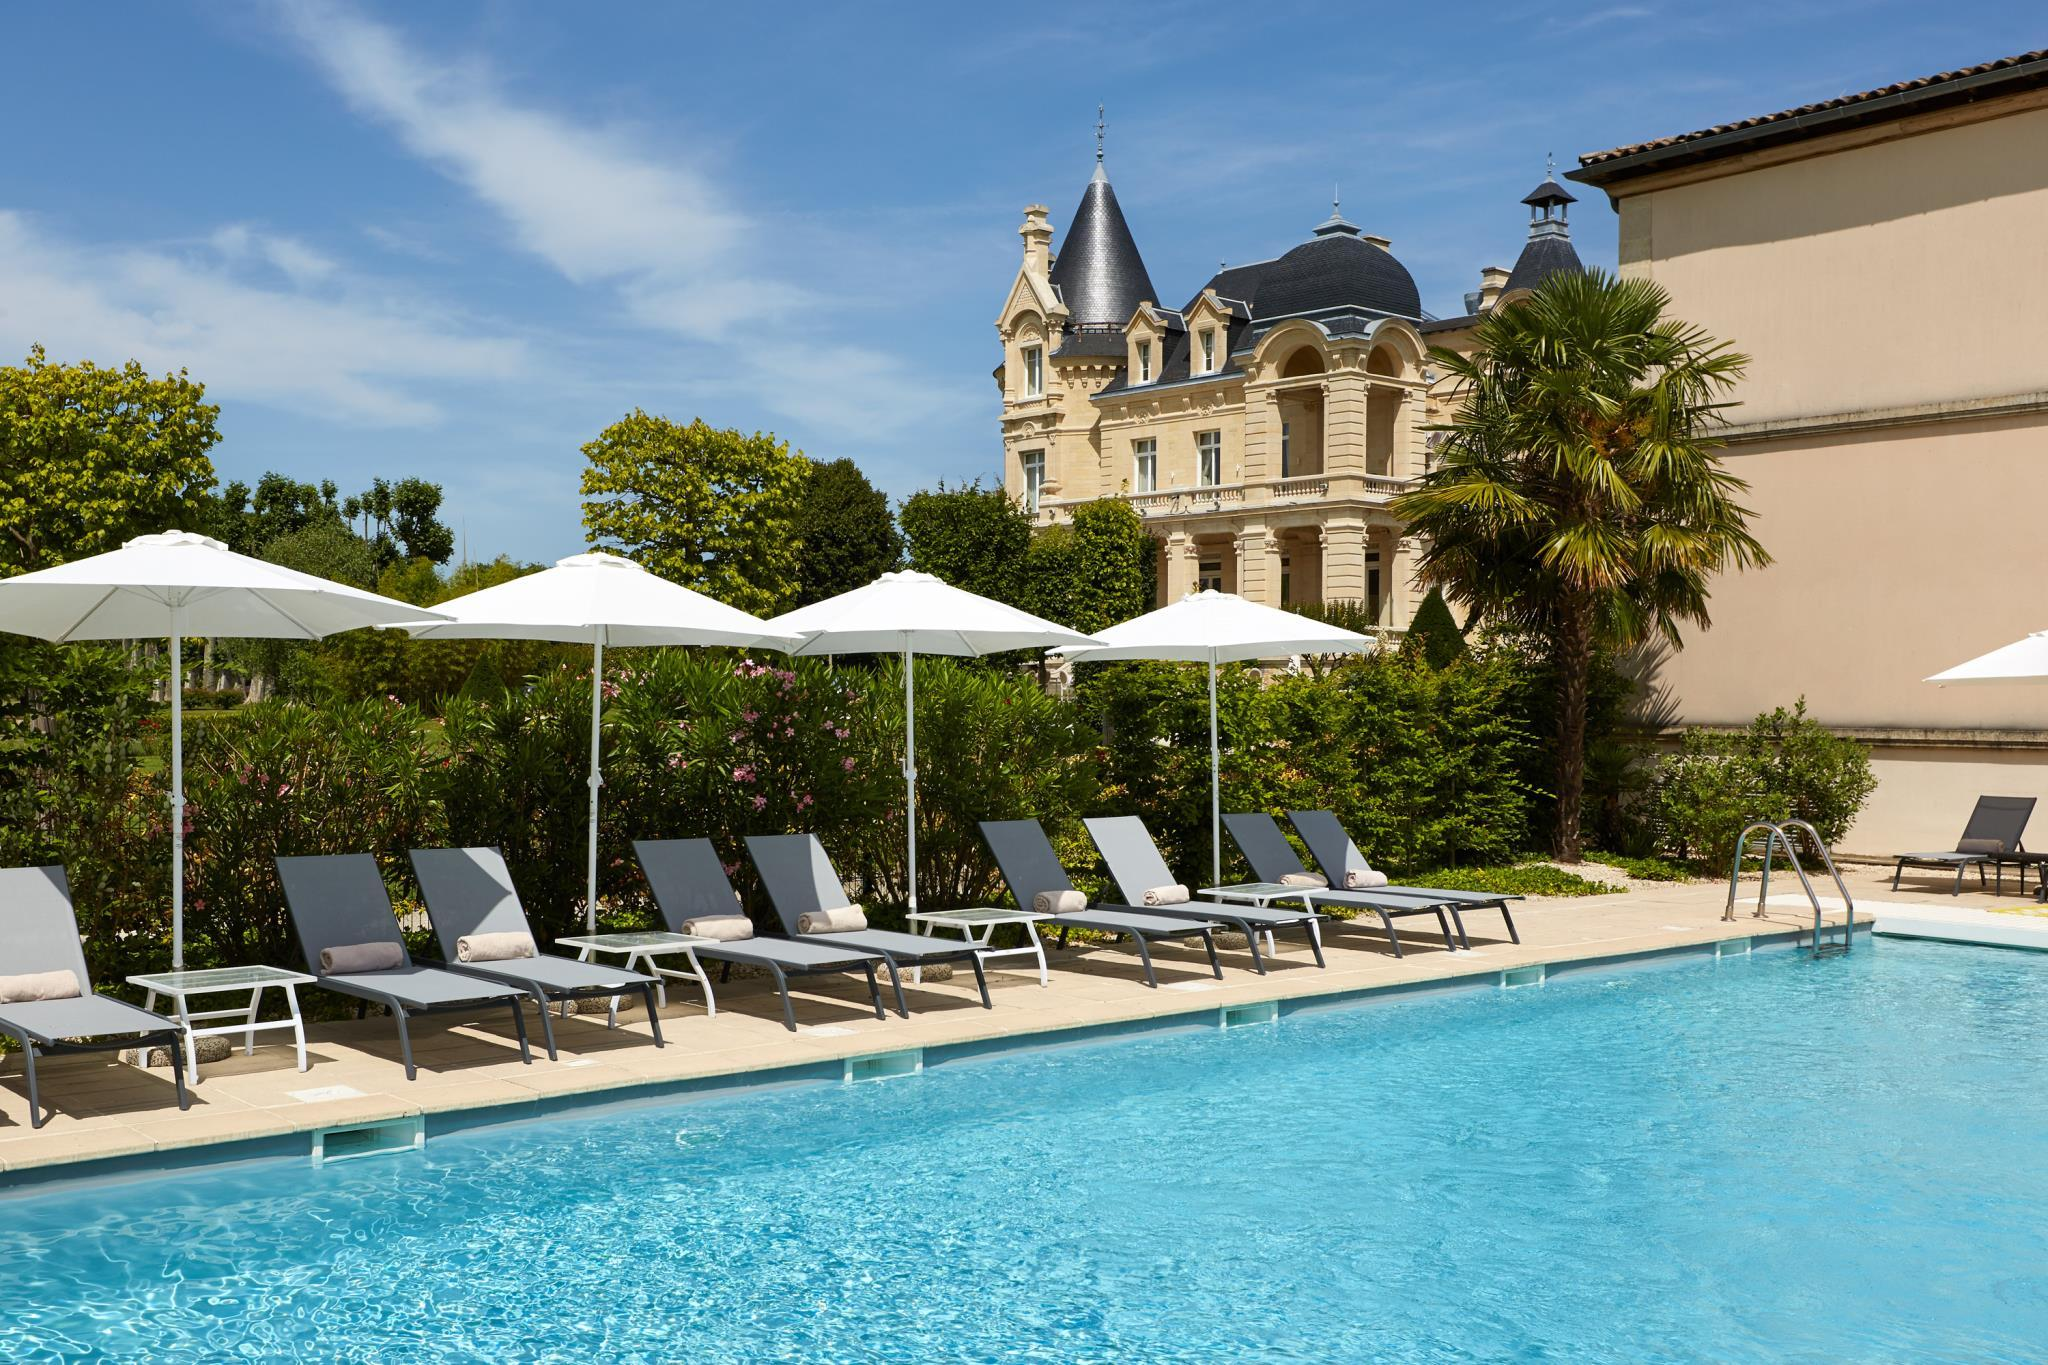 chateau hotel and spa grand barrail